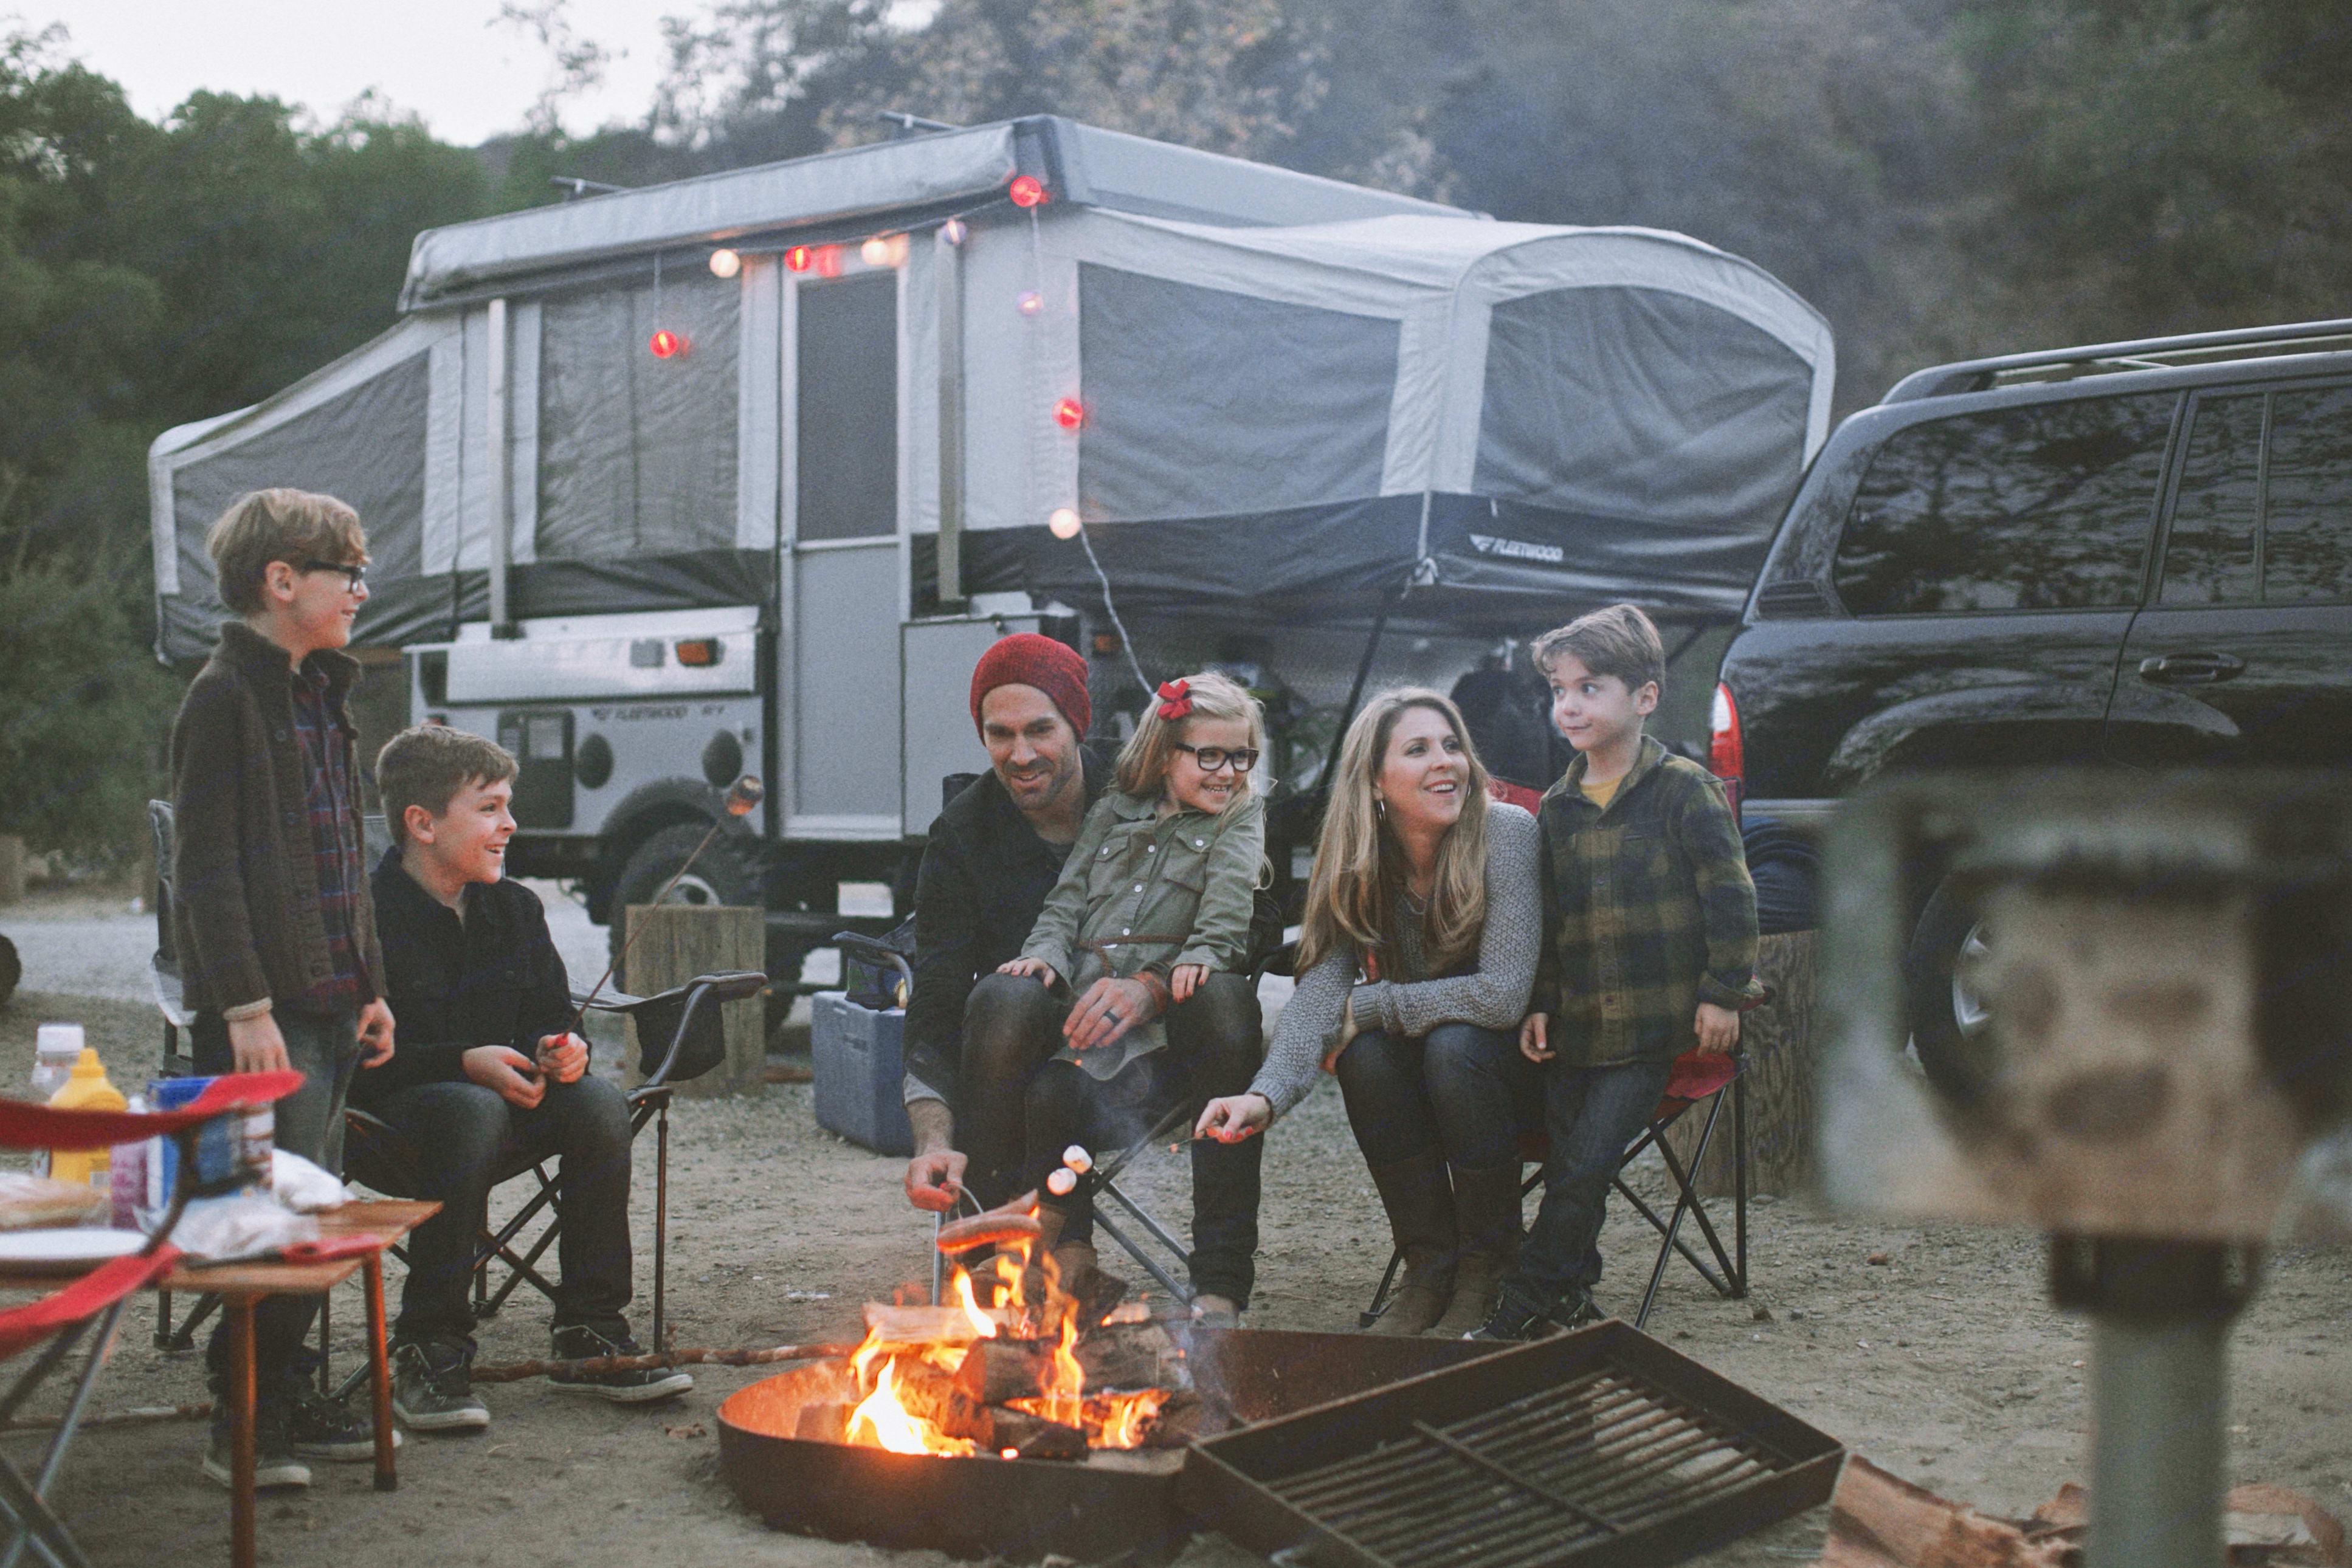 My family camping at Casper's. Fleetwood Evolution 1 (E1) 2008